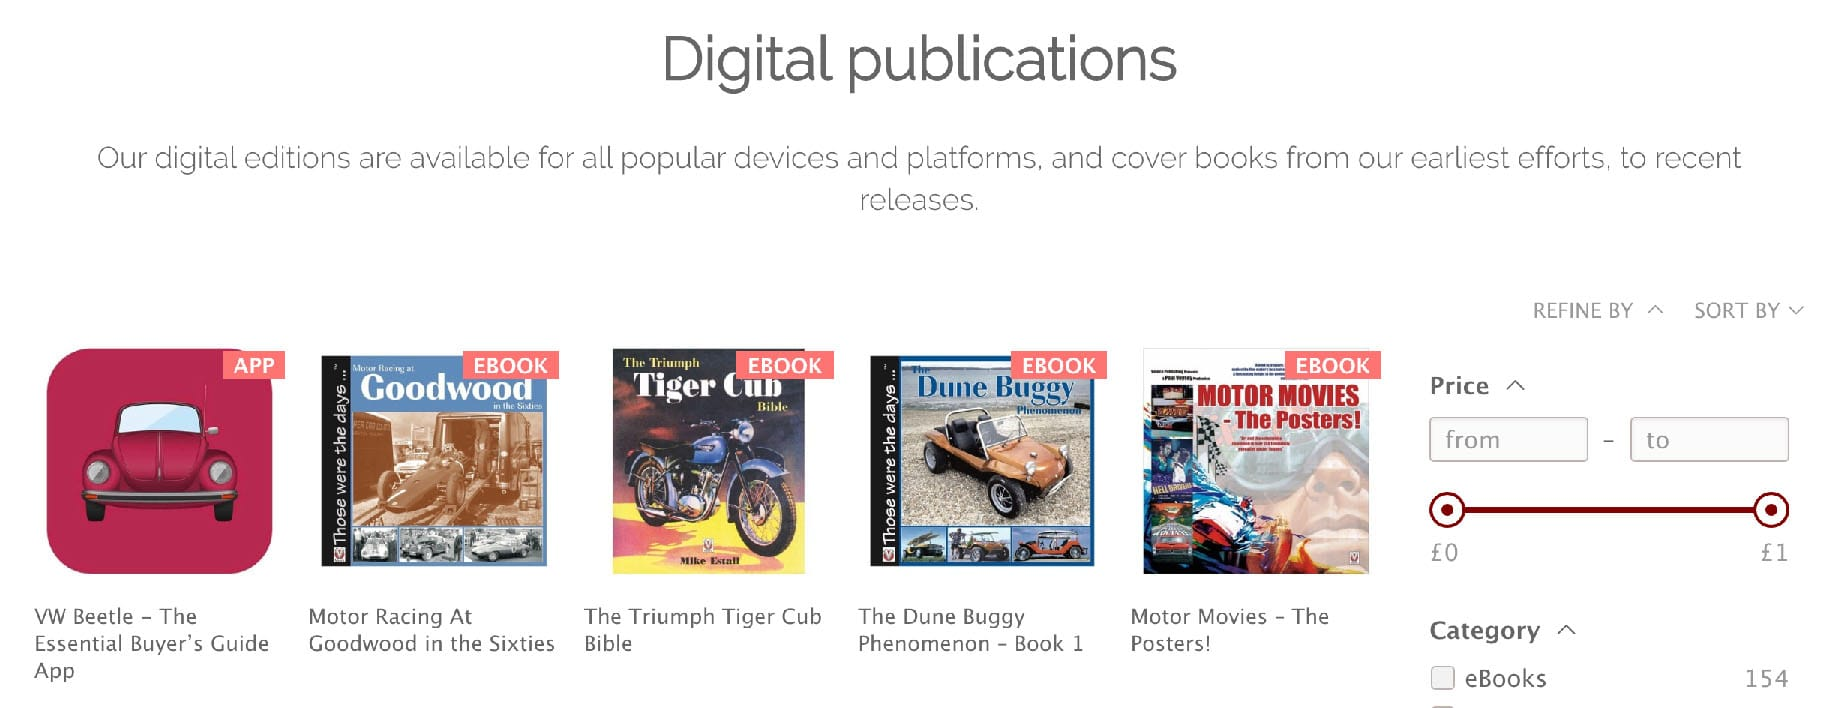 digital publication tags